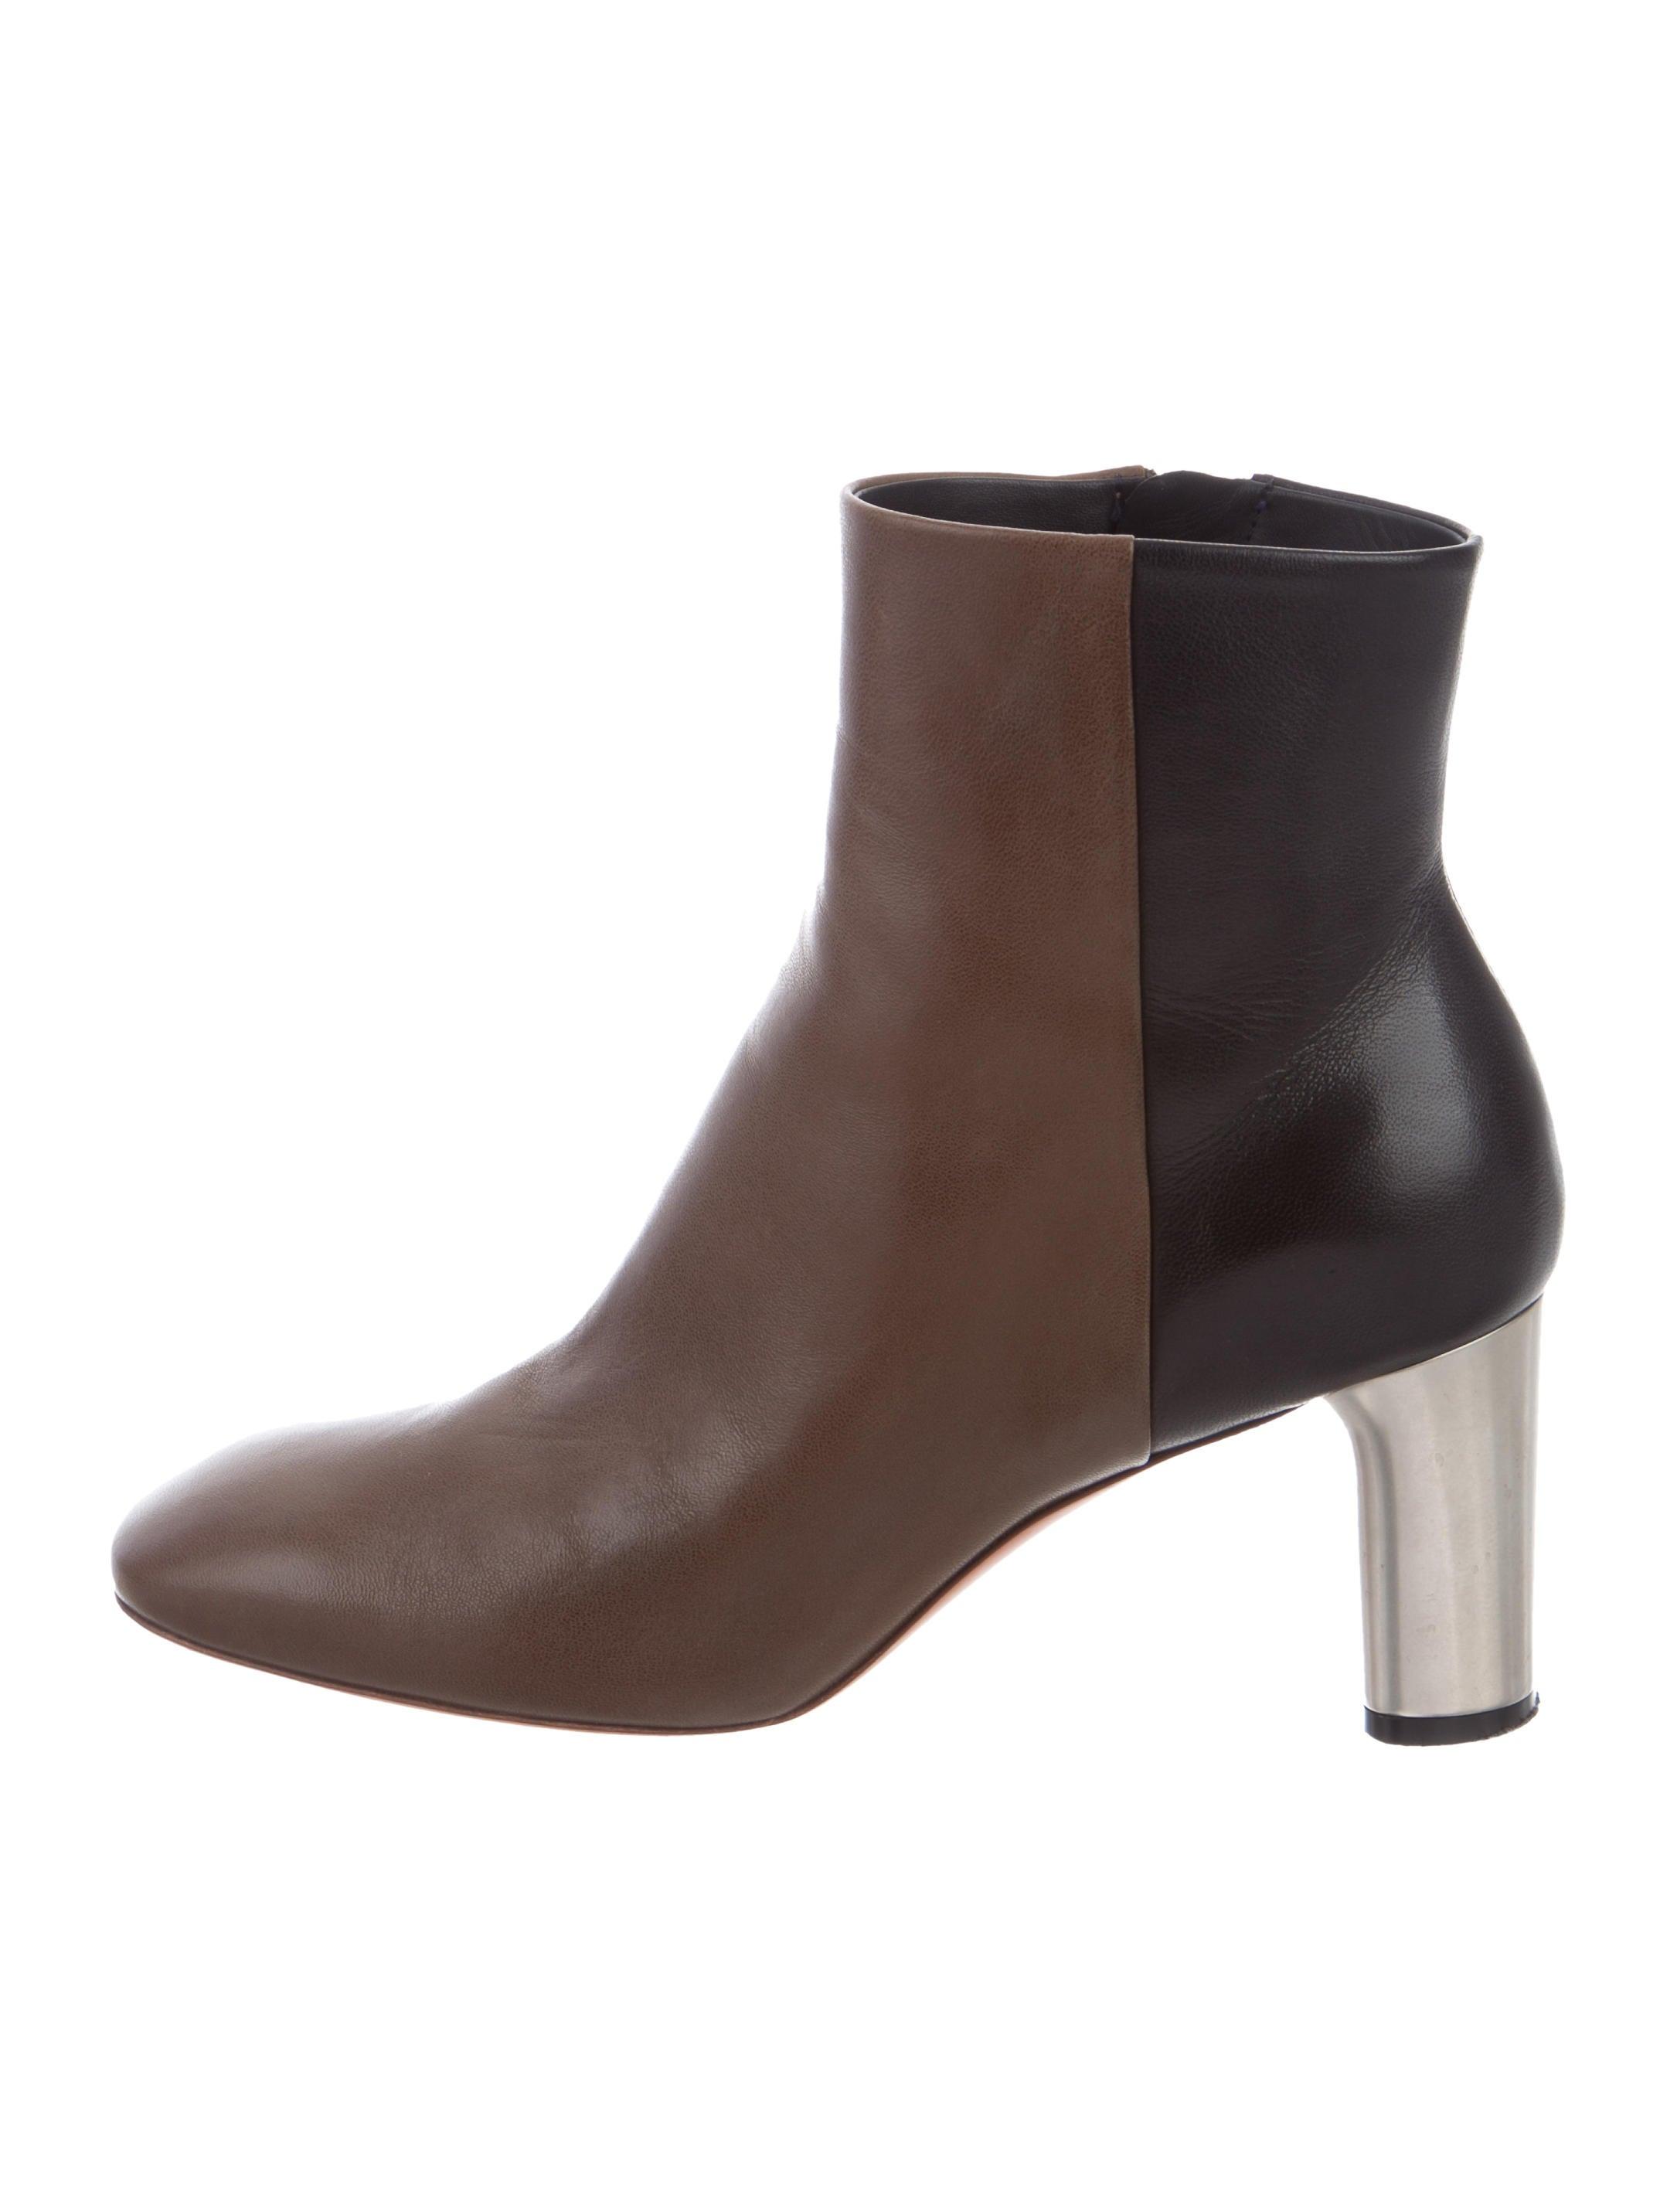 find great online buy cheap 2014 unisex Céline Bicolor Ankle Boots cheap sale high quality get authentic cheap price discount store MfnQlGp0QR